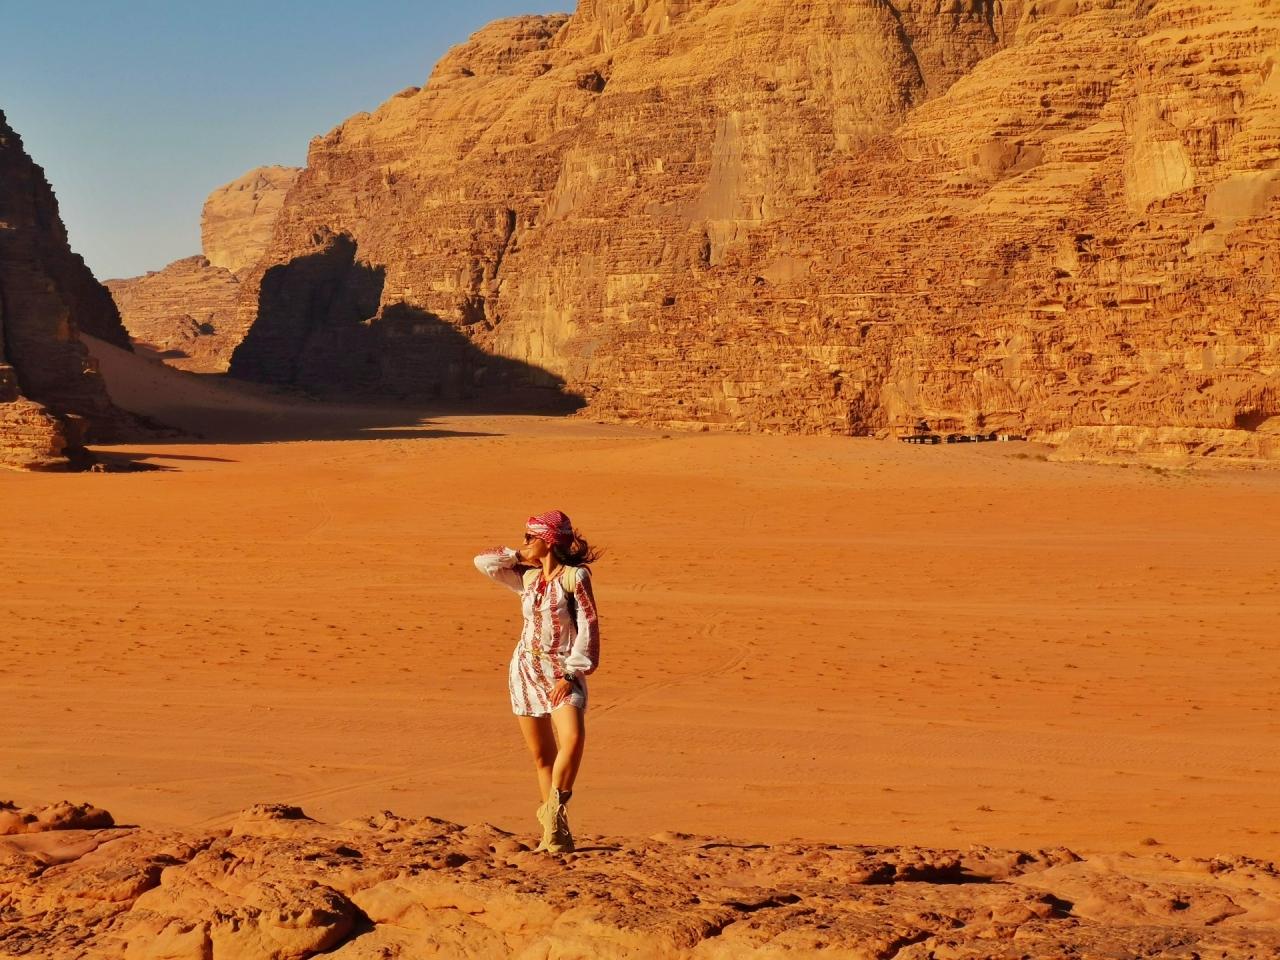 Fata in desert Wadi Rum